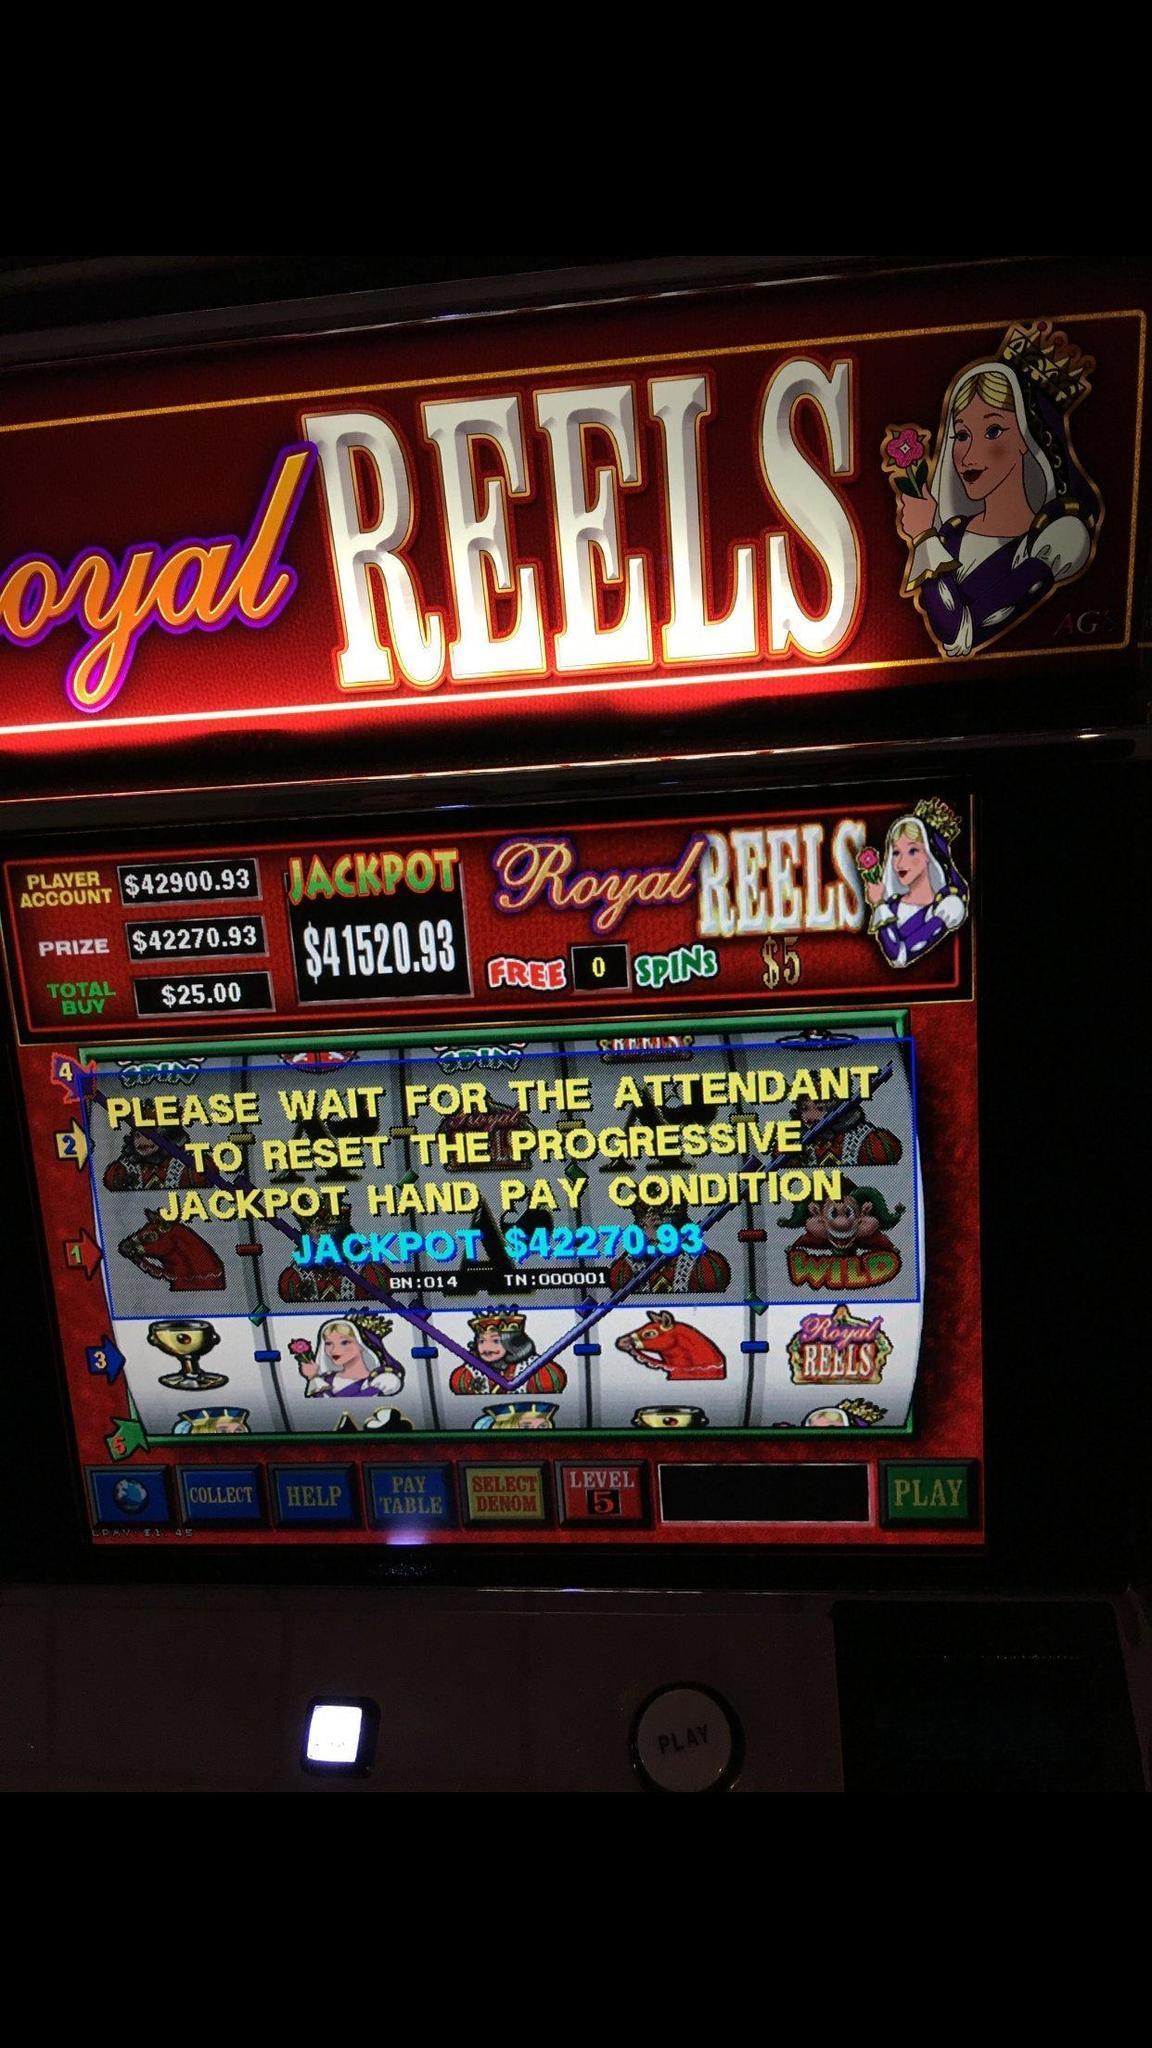 Royal reels slot machine jackpot